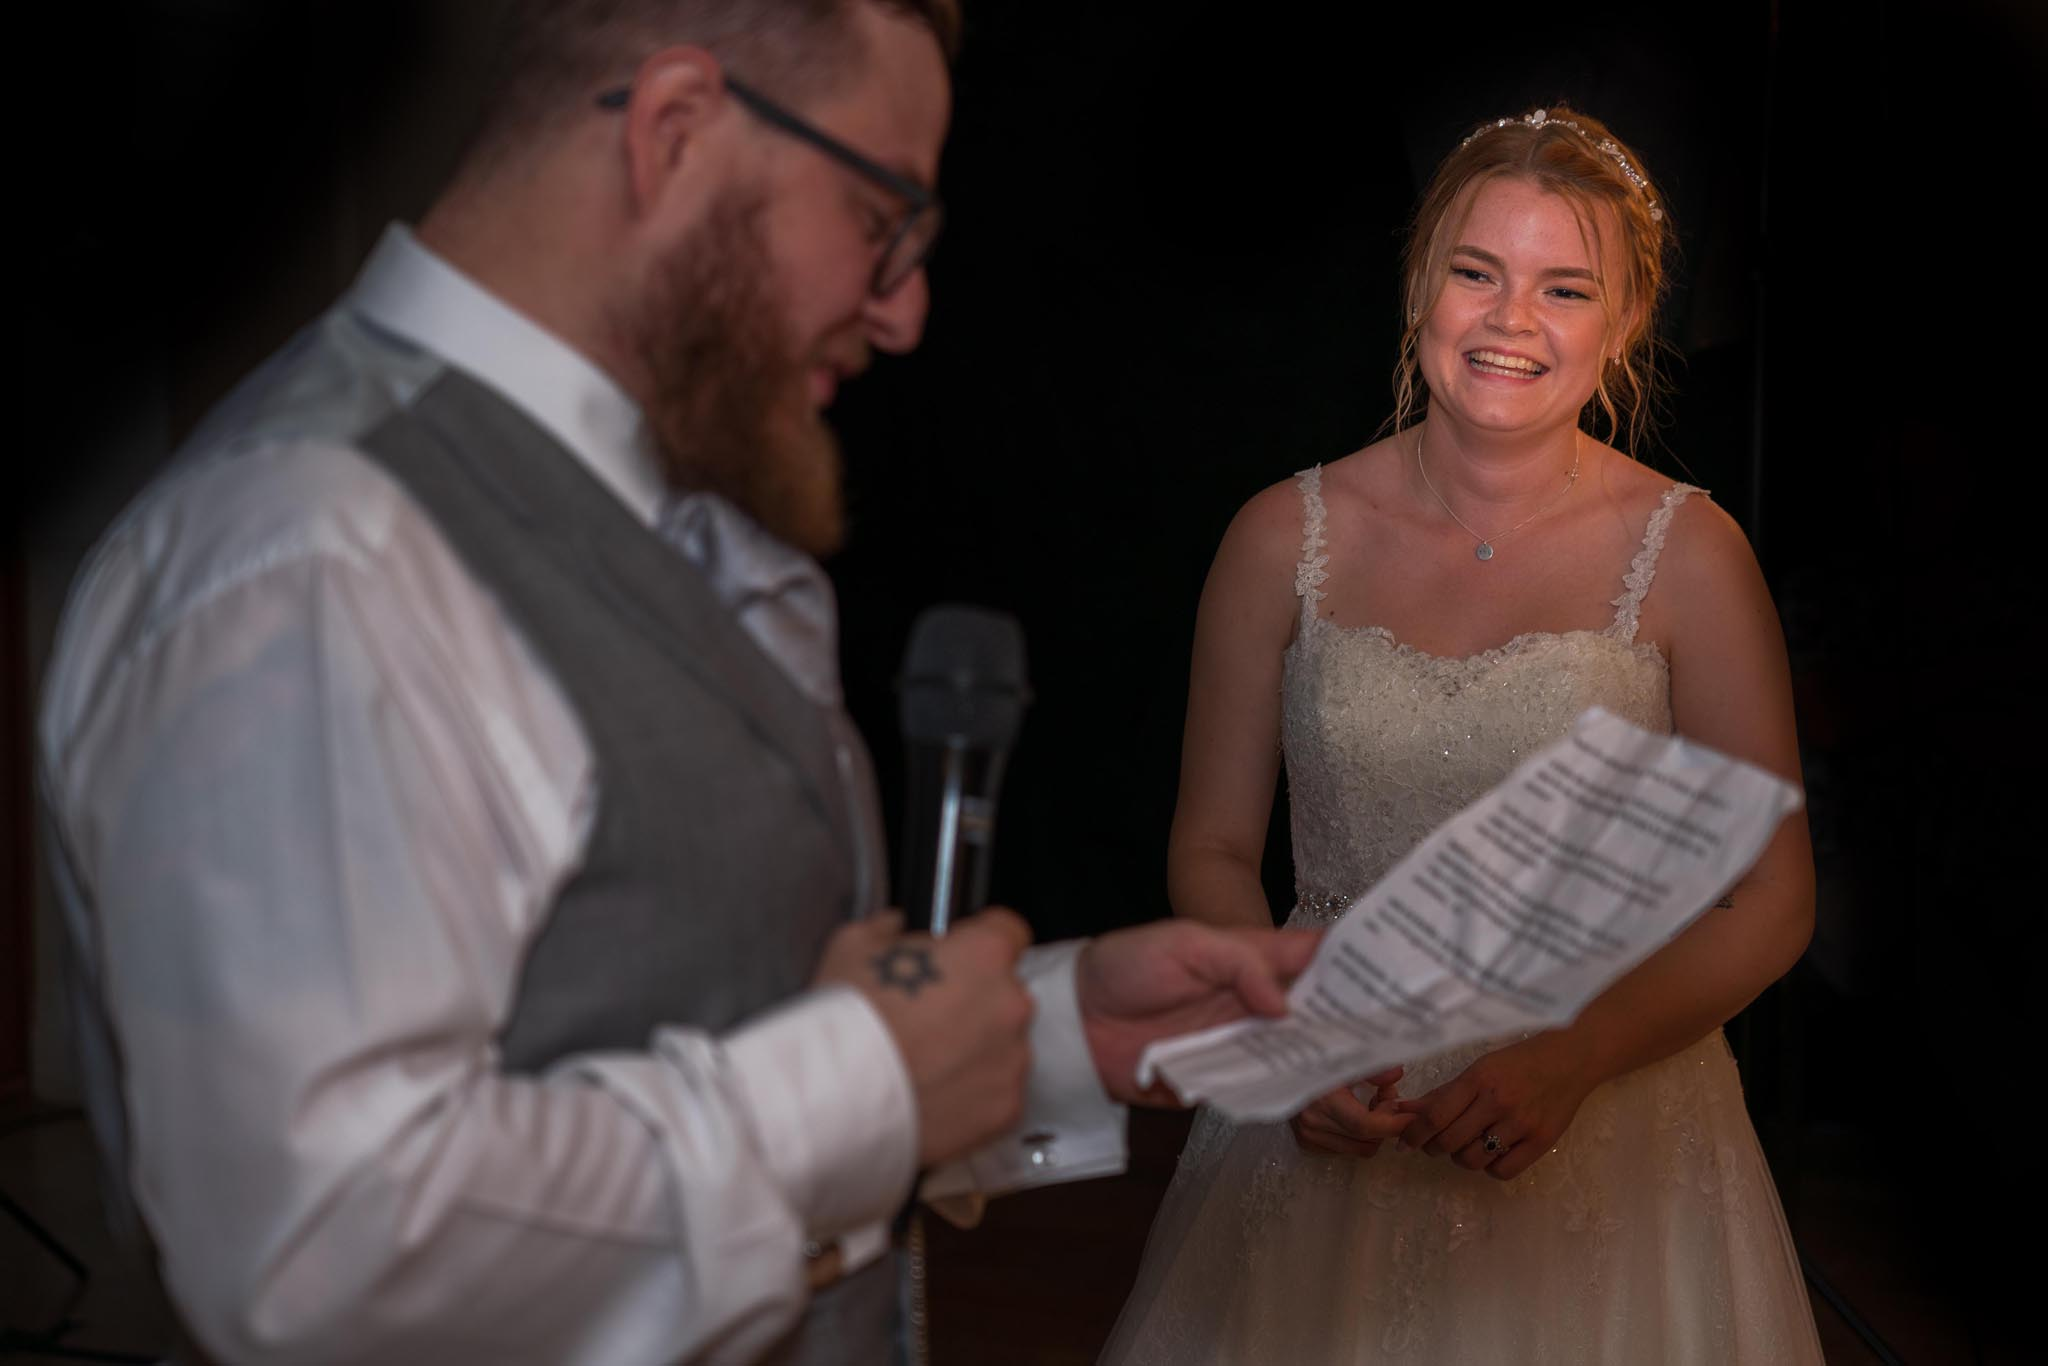 896-Speeches-Luke-Yasmin-The-Rayleigh-Club-Wedding-Photography.jpg